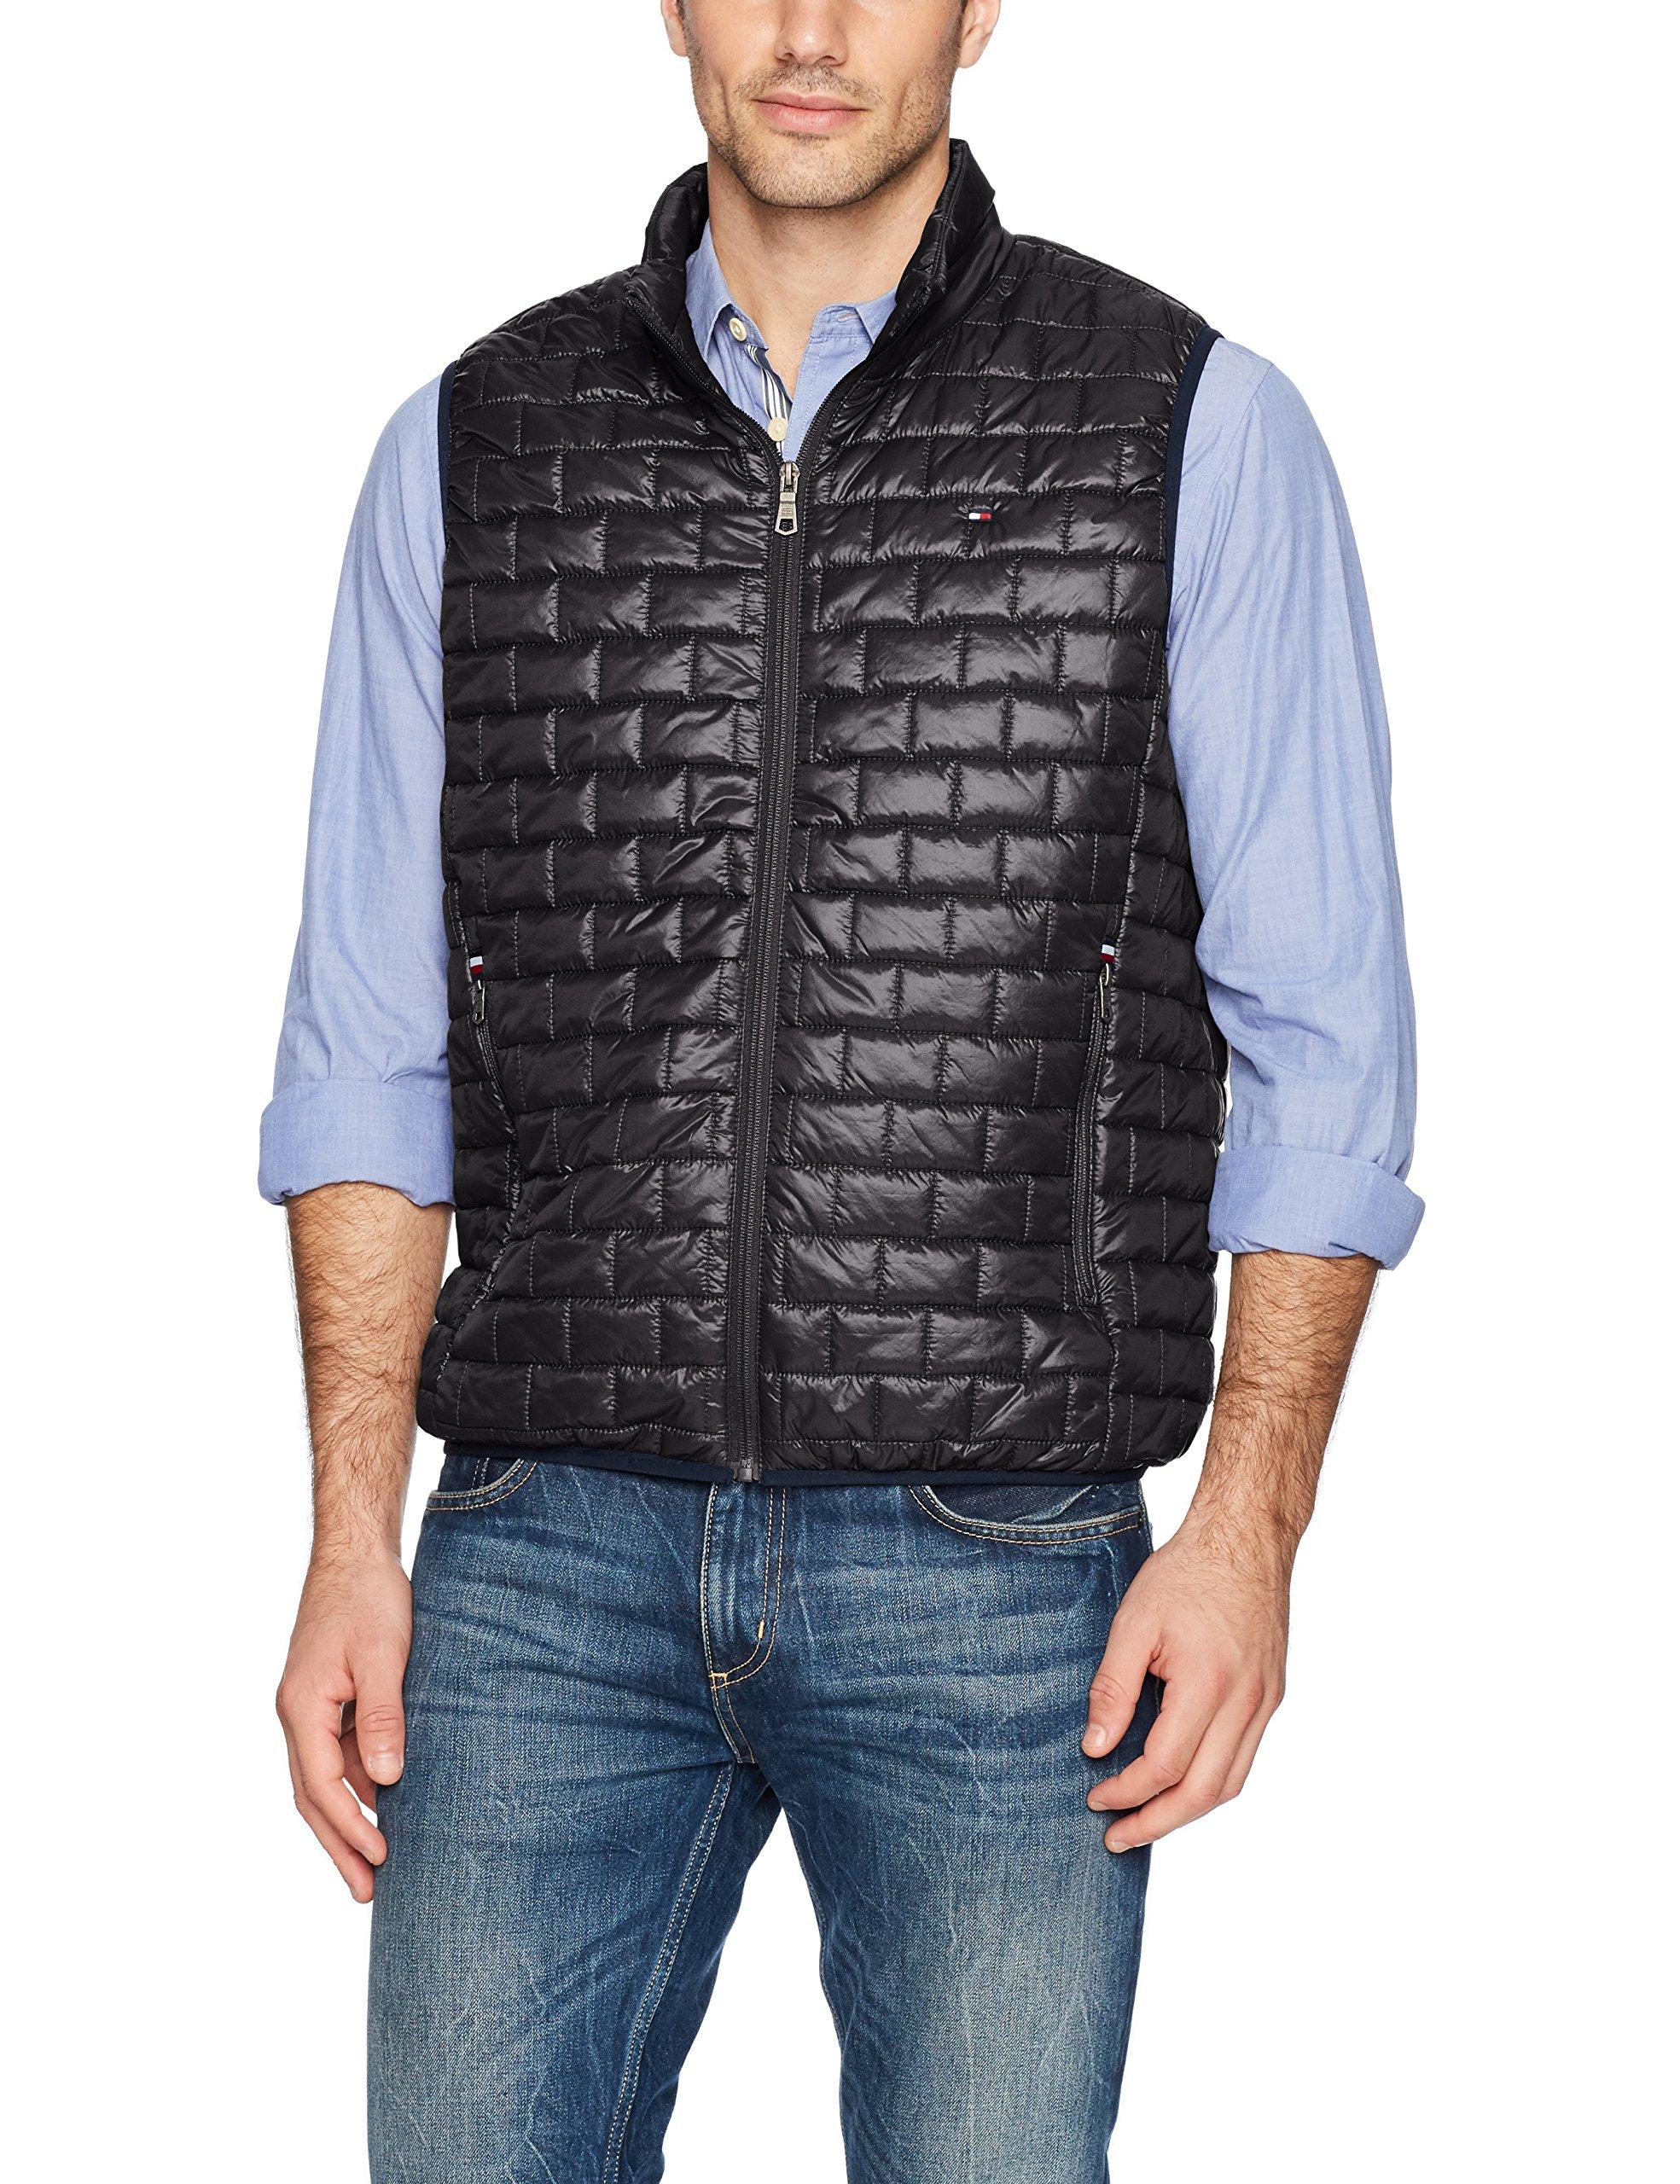 Tommy Hilfiger Men's Box Quilted Lightweight Ultra Loft Vest, Black, X-Large by Tommy Hilfiger